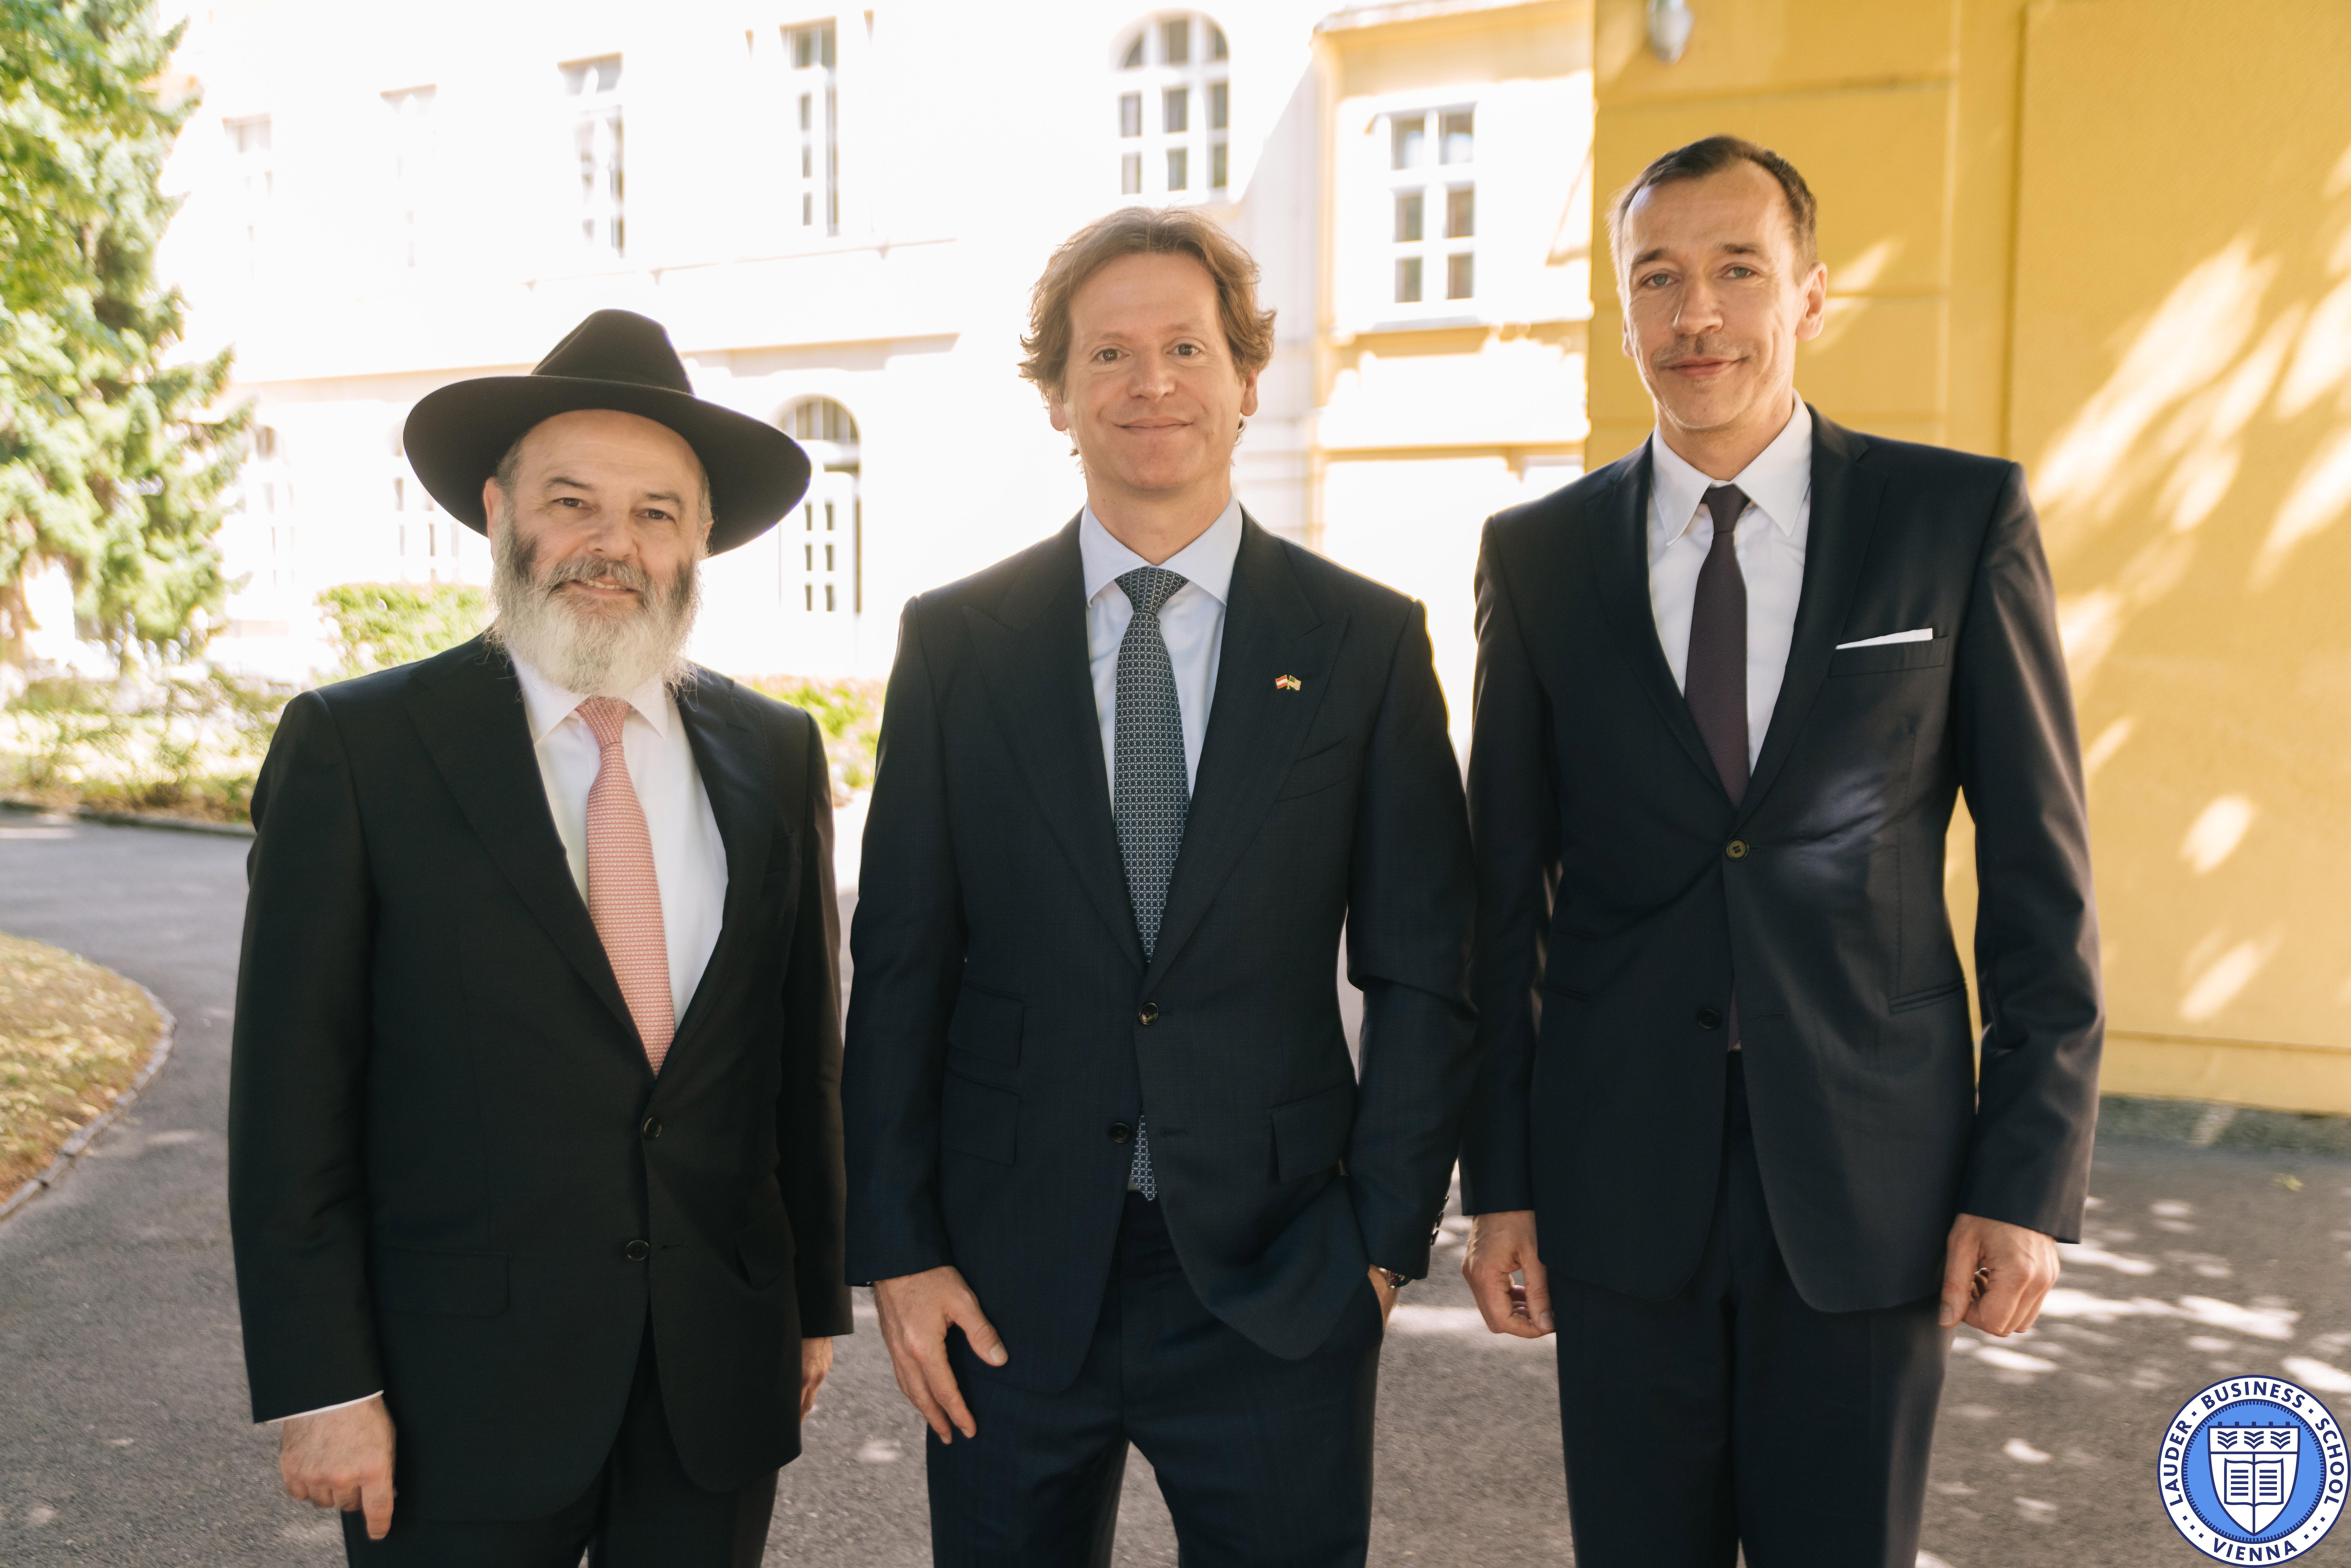 His Excellency Trevor D. Traina, US Ambassador to Austria (middle), LBS Vice President Prof. Jacob I. Biderman (left), LBS Executive Director Mr. Alexander Zirkler (right)